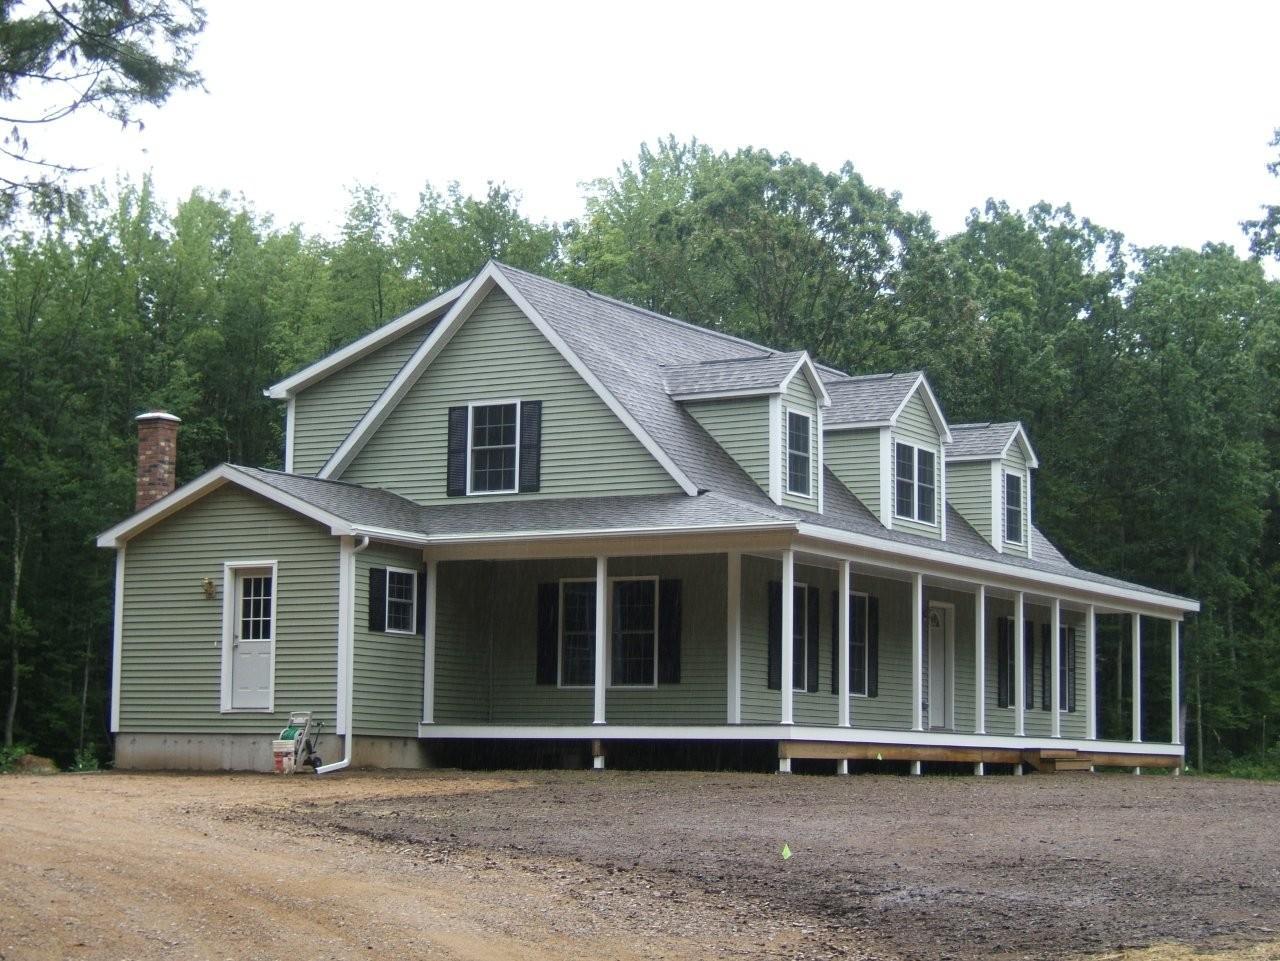 Best Modular Home Builder In Virginia Virginia Modular Homes 1st